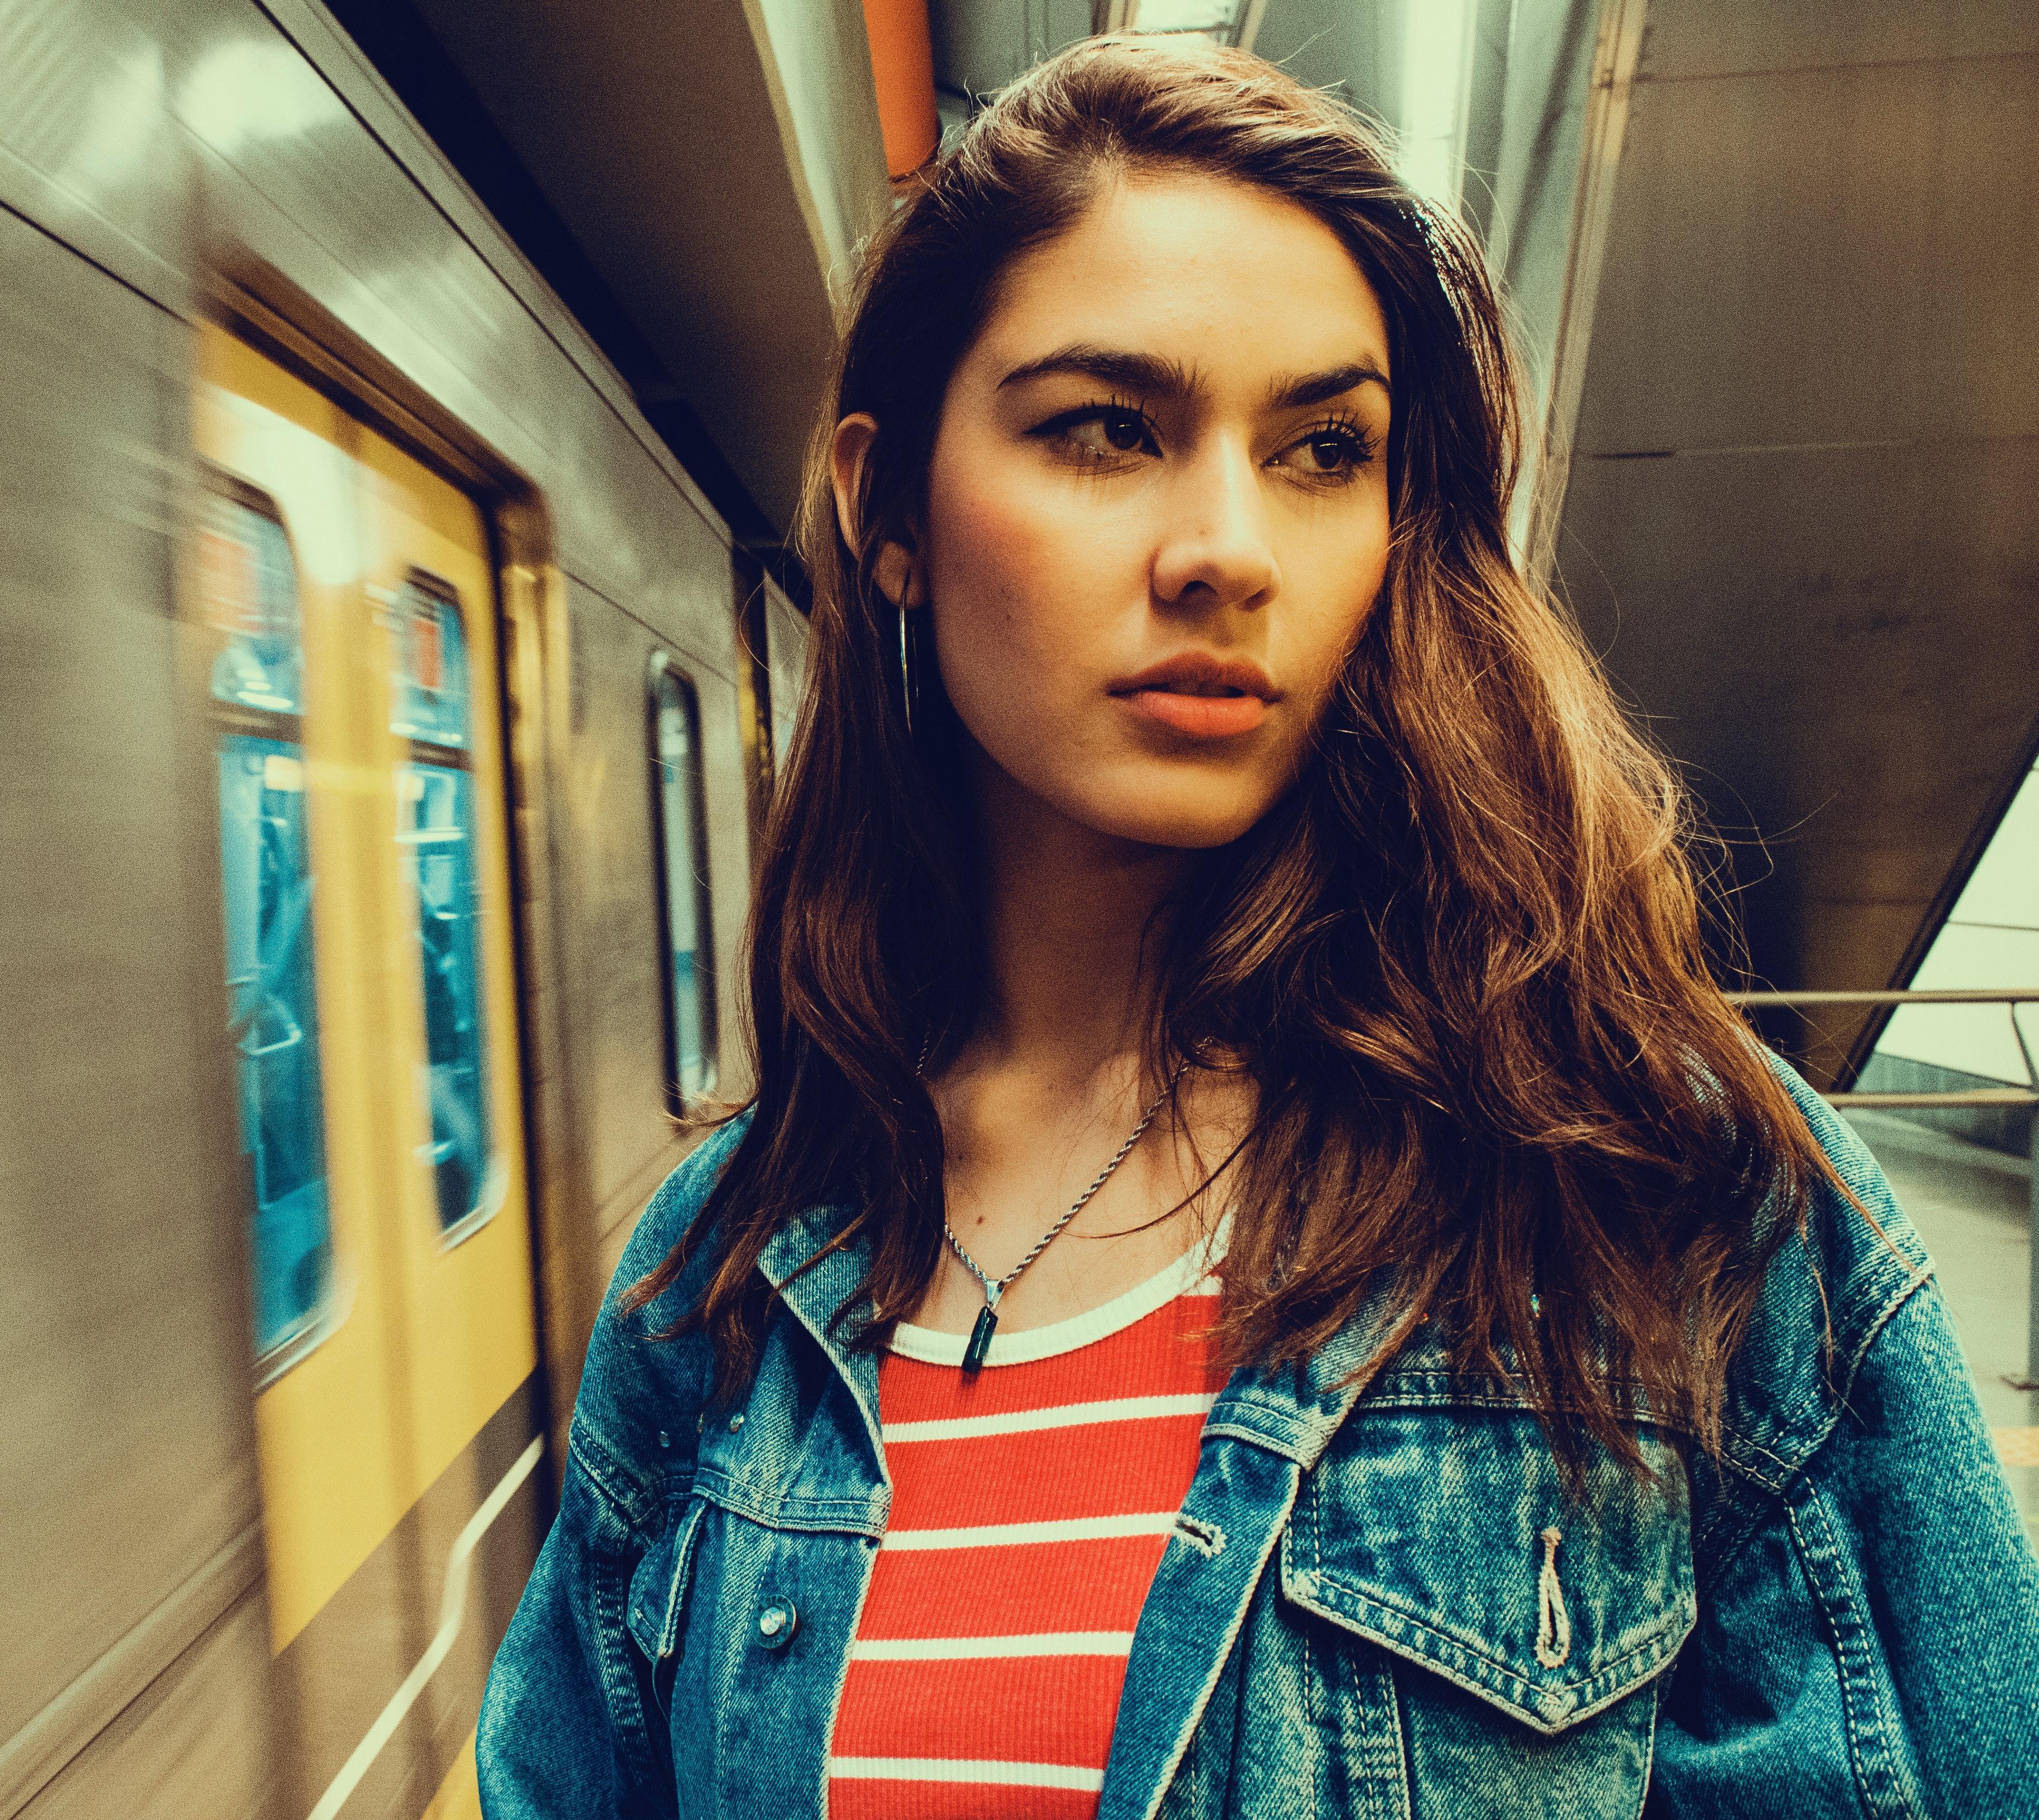 Photo of a woman wearing blue denim jacket